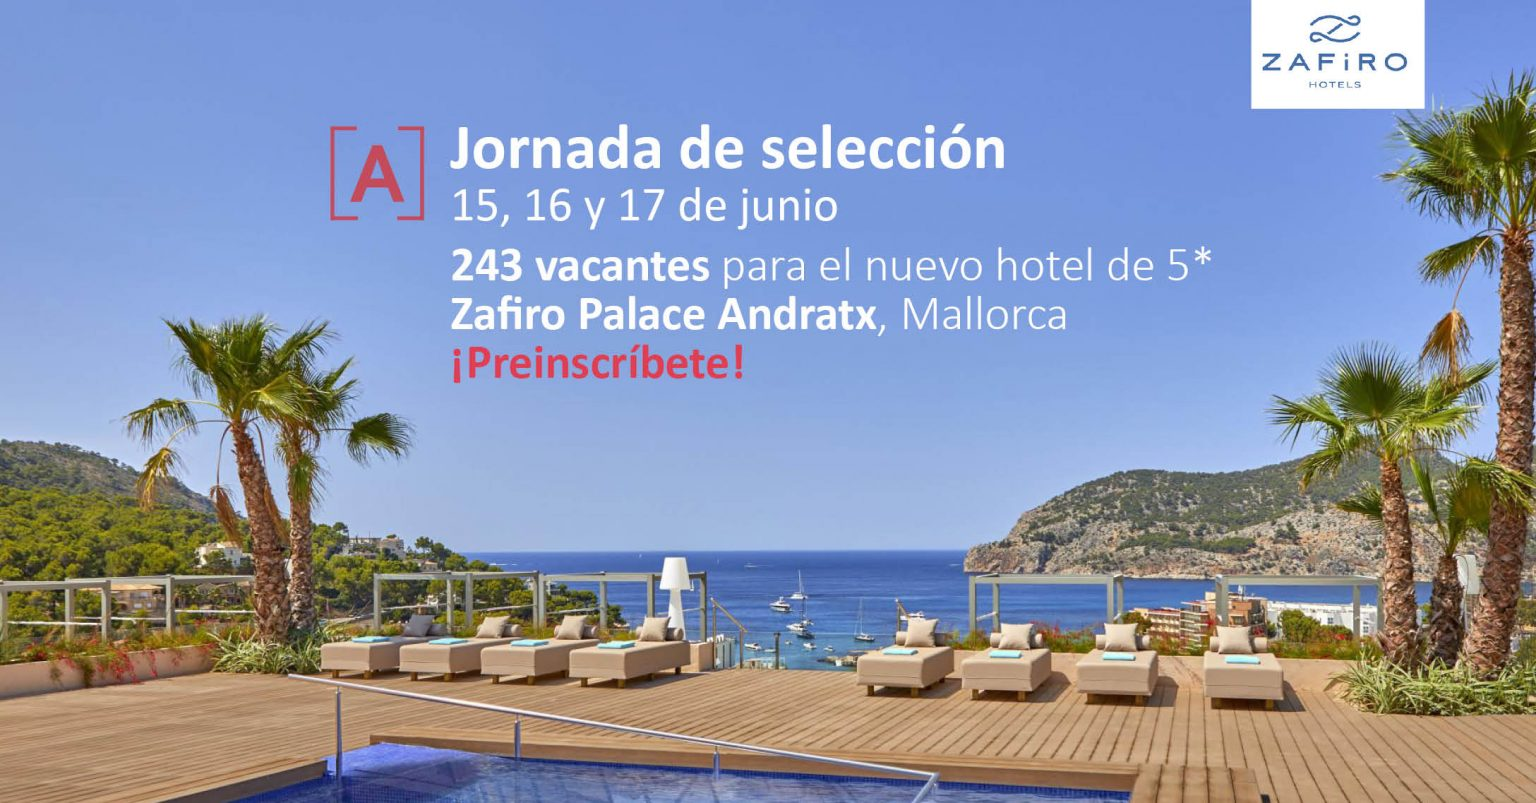 Zafiro Palace Andratx auf Mallorca sucht fast 250 MItarbeiter